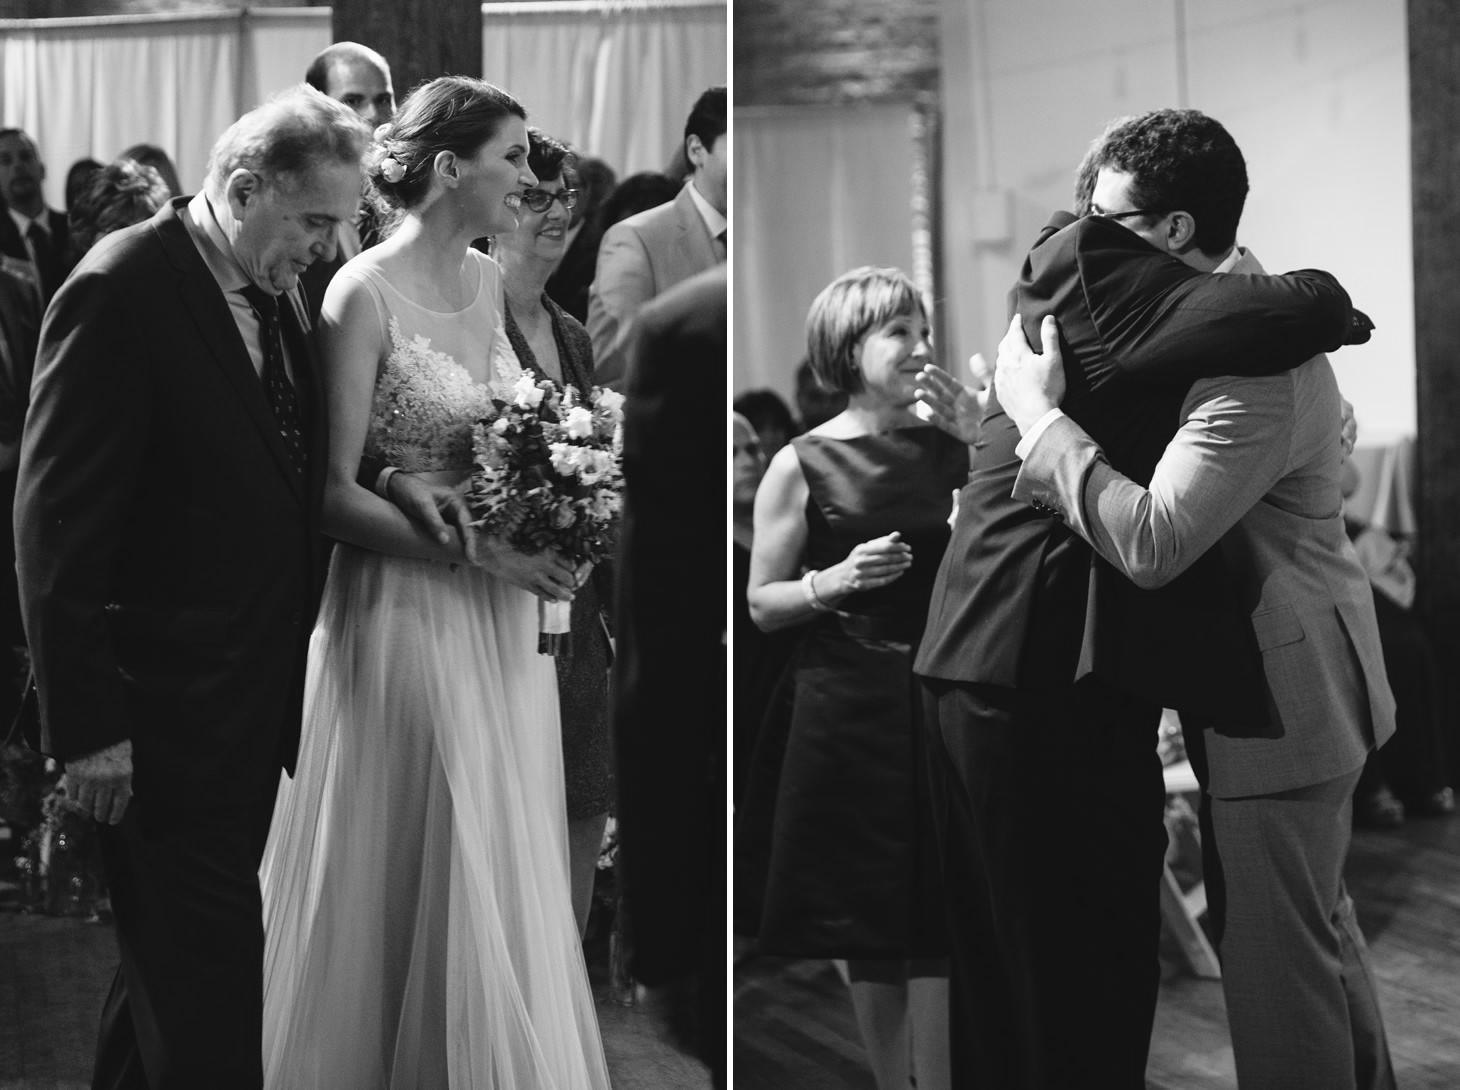 015-nyc-dumbo-loft-brooklyn-wedding-photographer-smitten-chickens-photo-.jpg